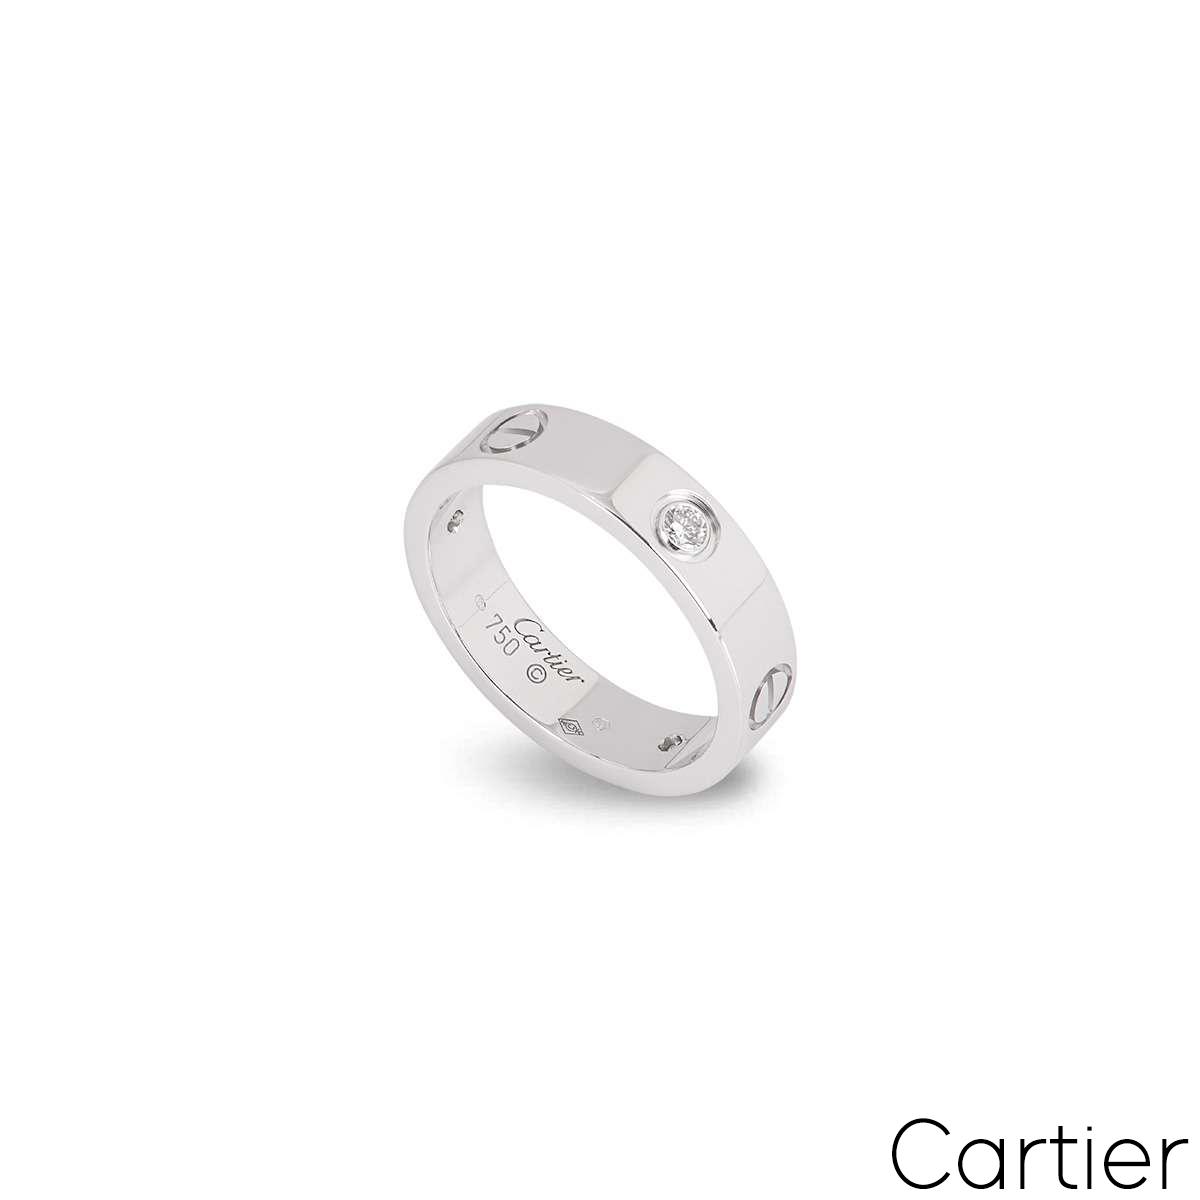 Cartier White Gold Half Diamond Love Ring Size 54 B4032500